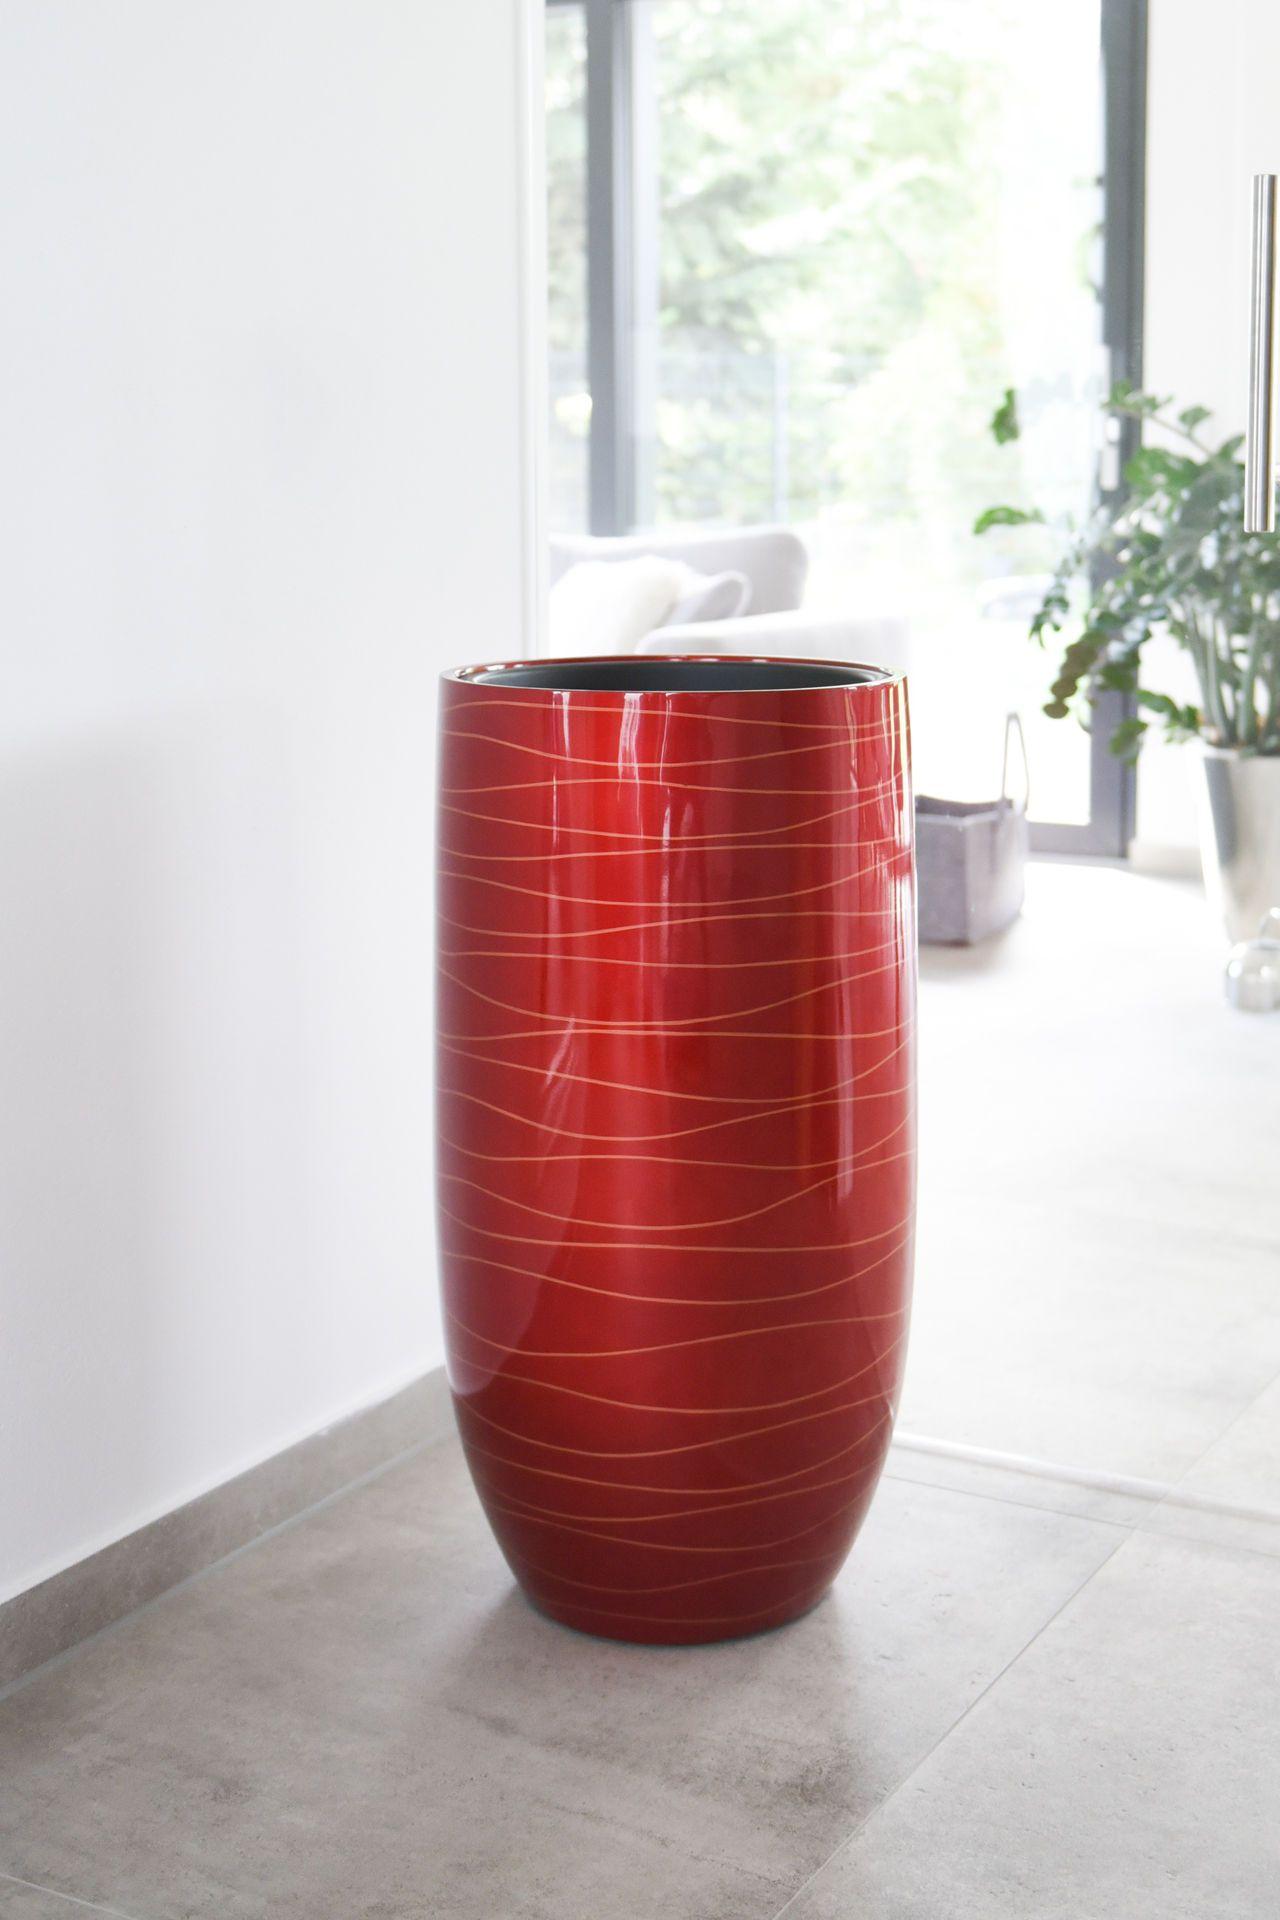 pflanzk bel blumenk bel exklusiv fiberglas asconia rot. Black Bedroom Furniture Sets. Home Design Ideas